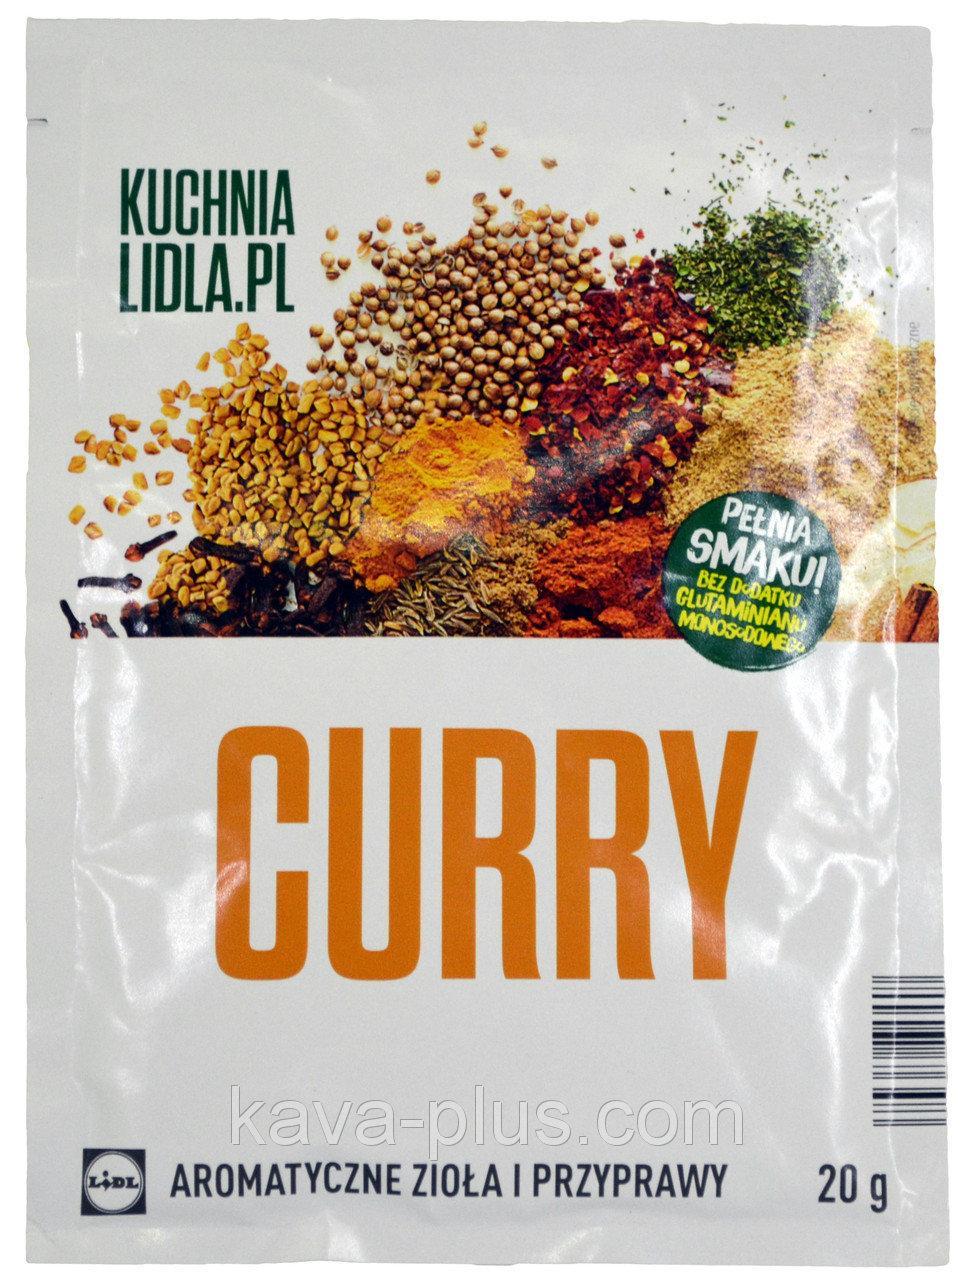 Приправа Kuchnia Lidla.Pl Curry 20 г